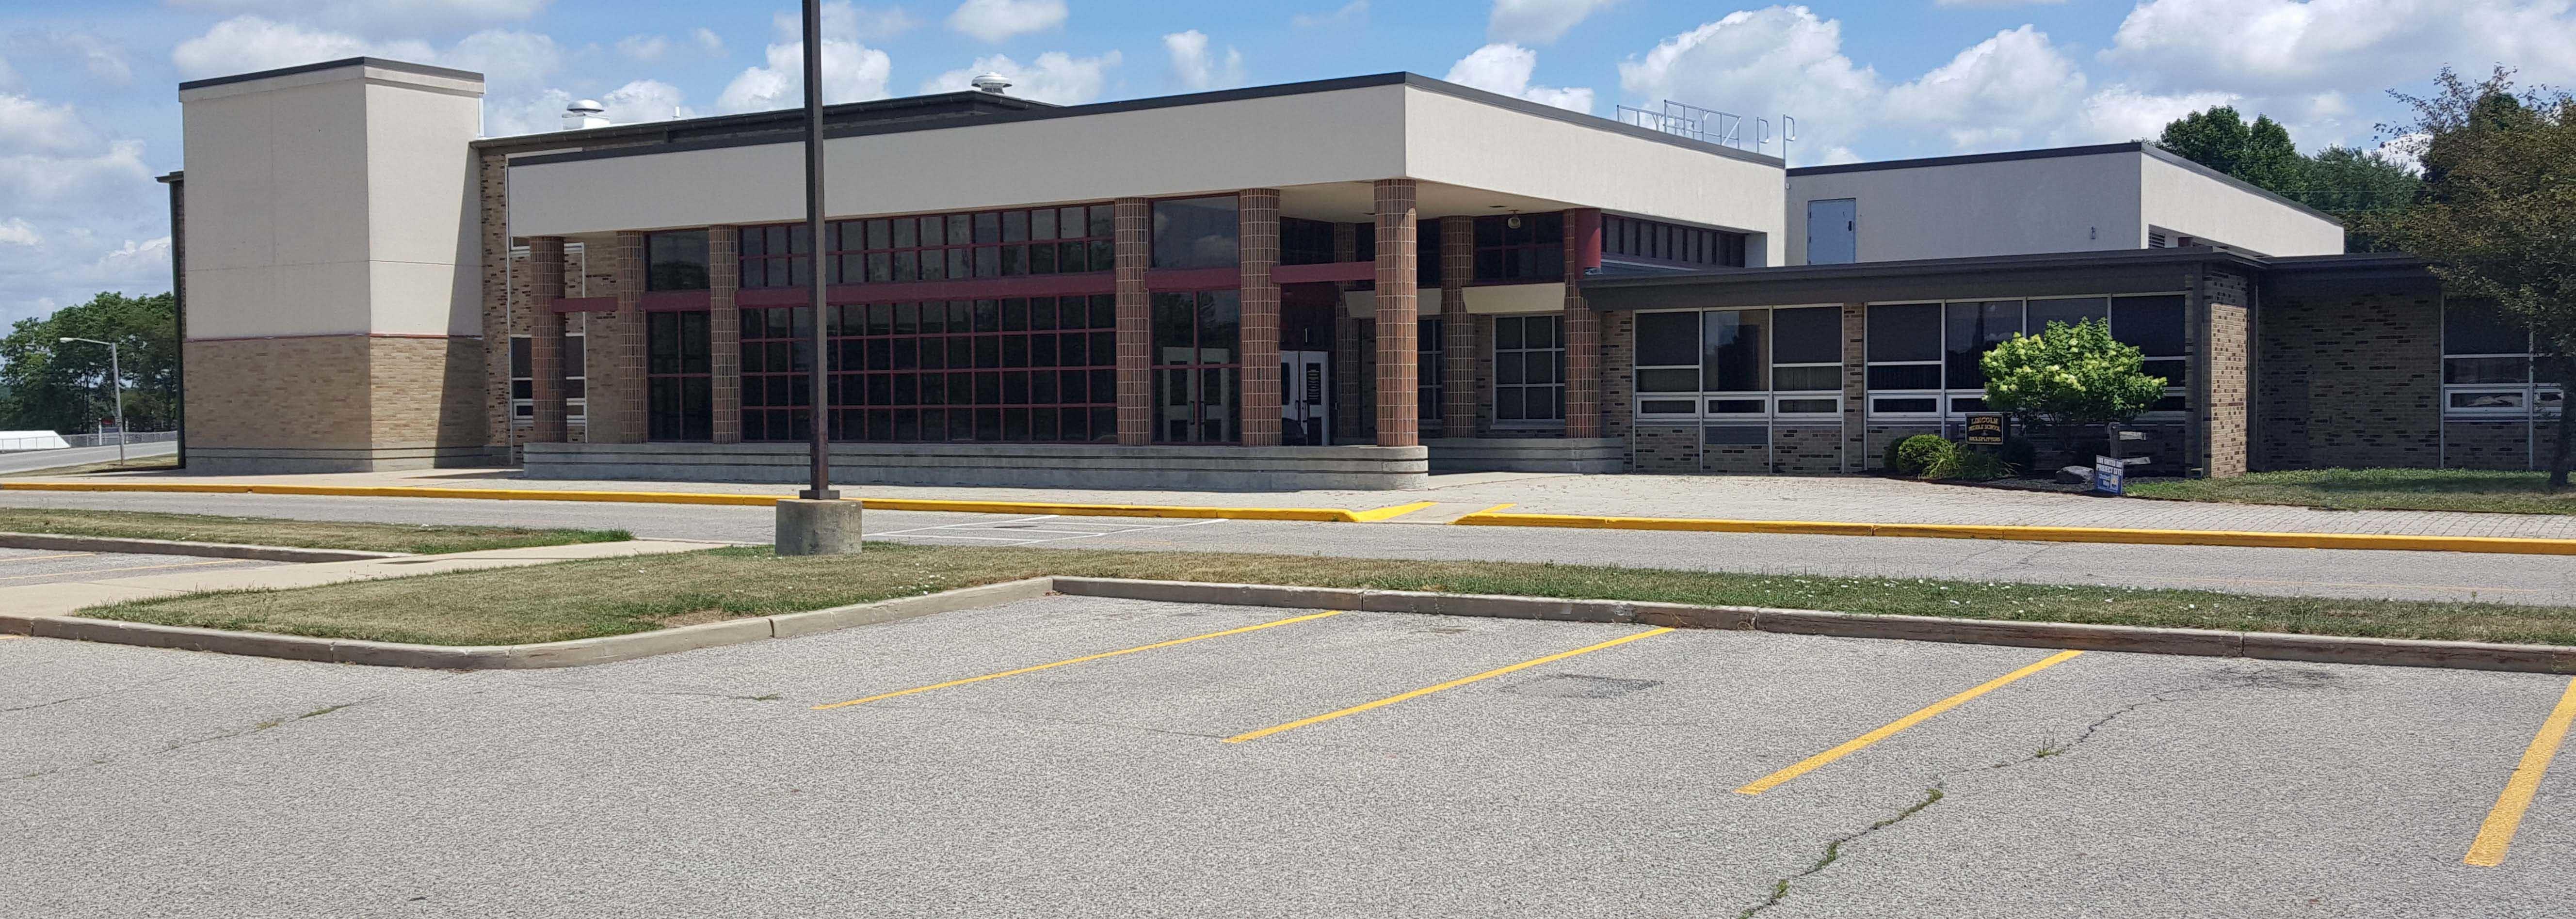 Exterior view of Logansport Junior High School